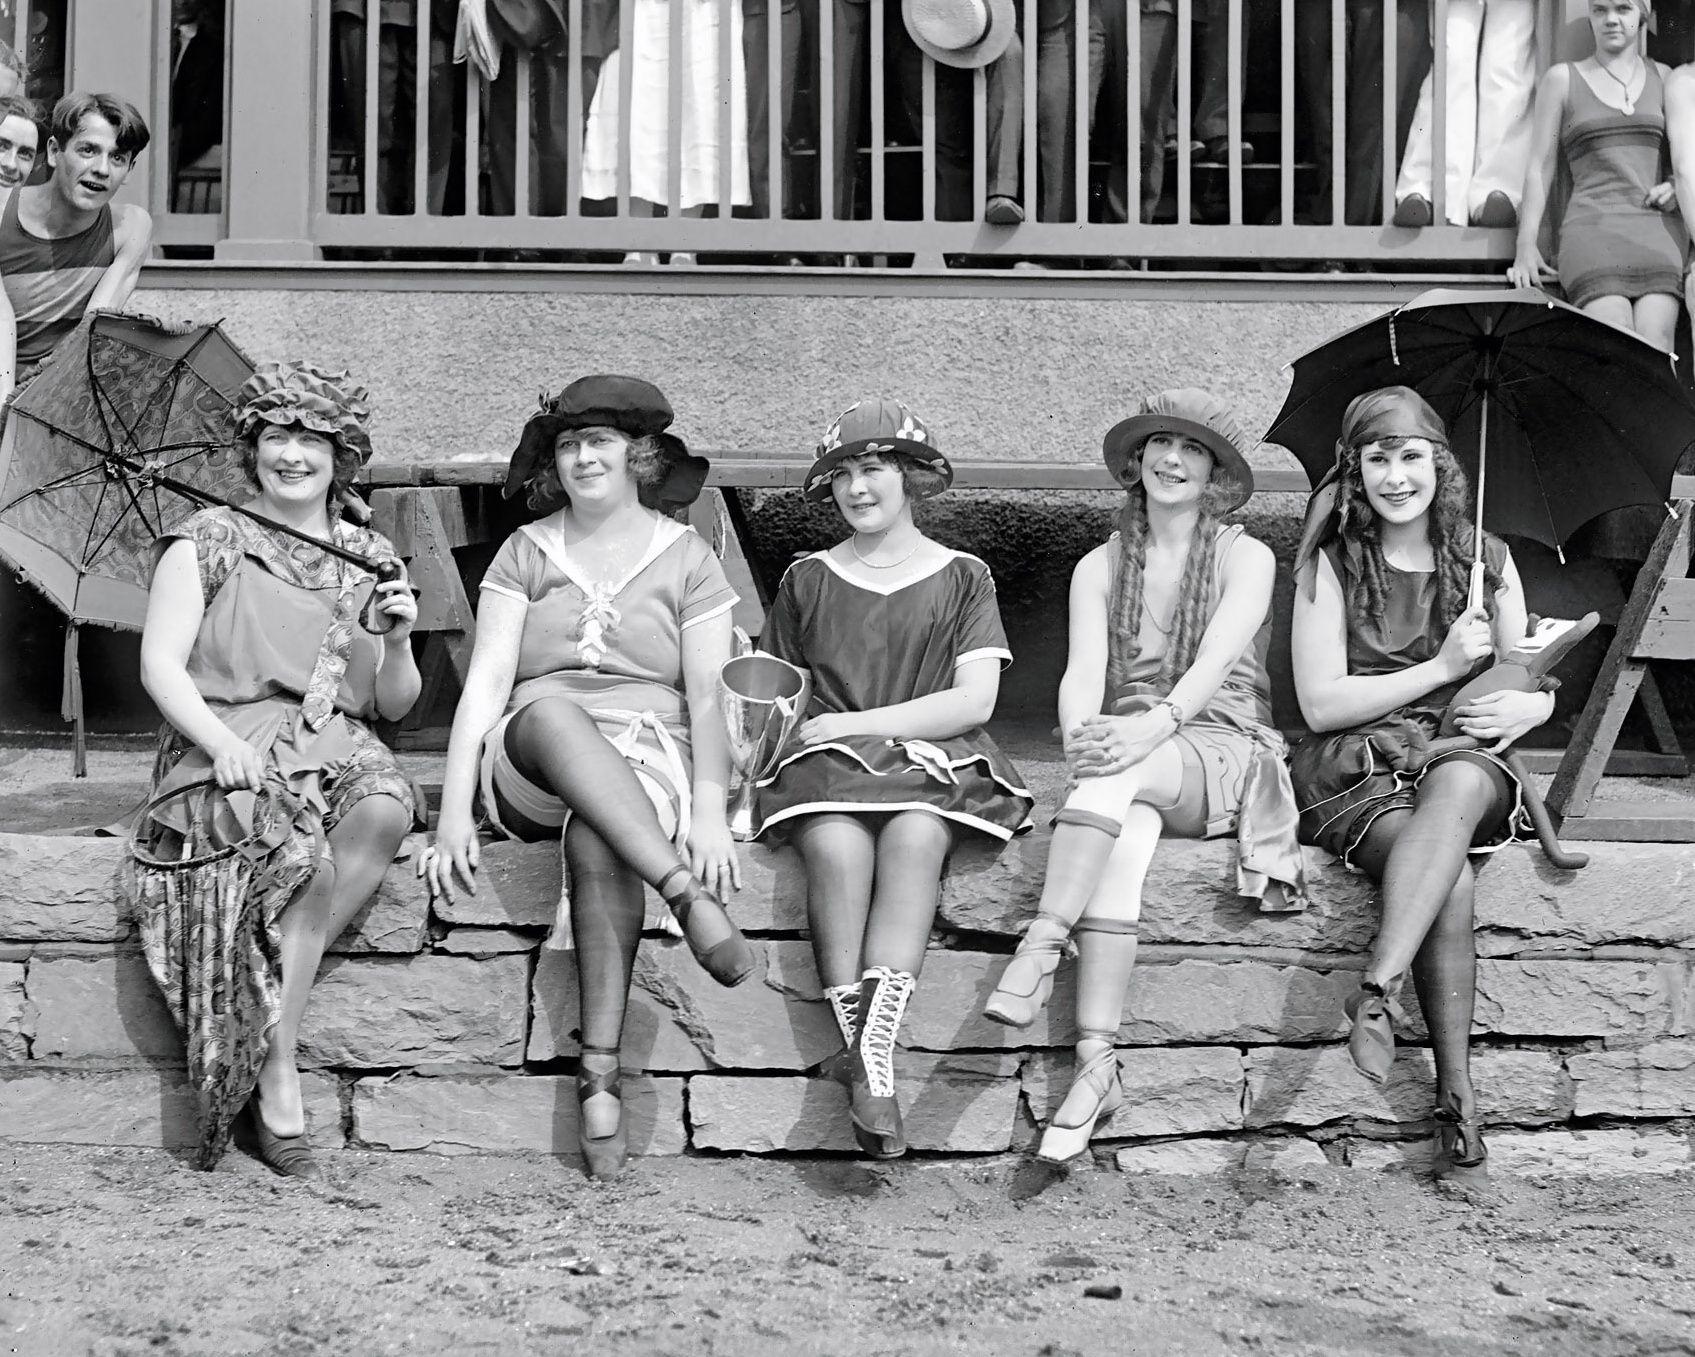 Рамблер секс начало 20 века 5 фотография